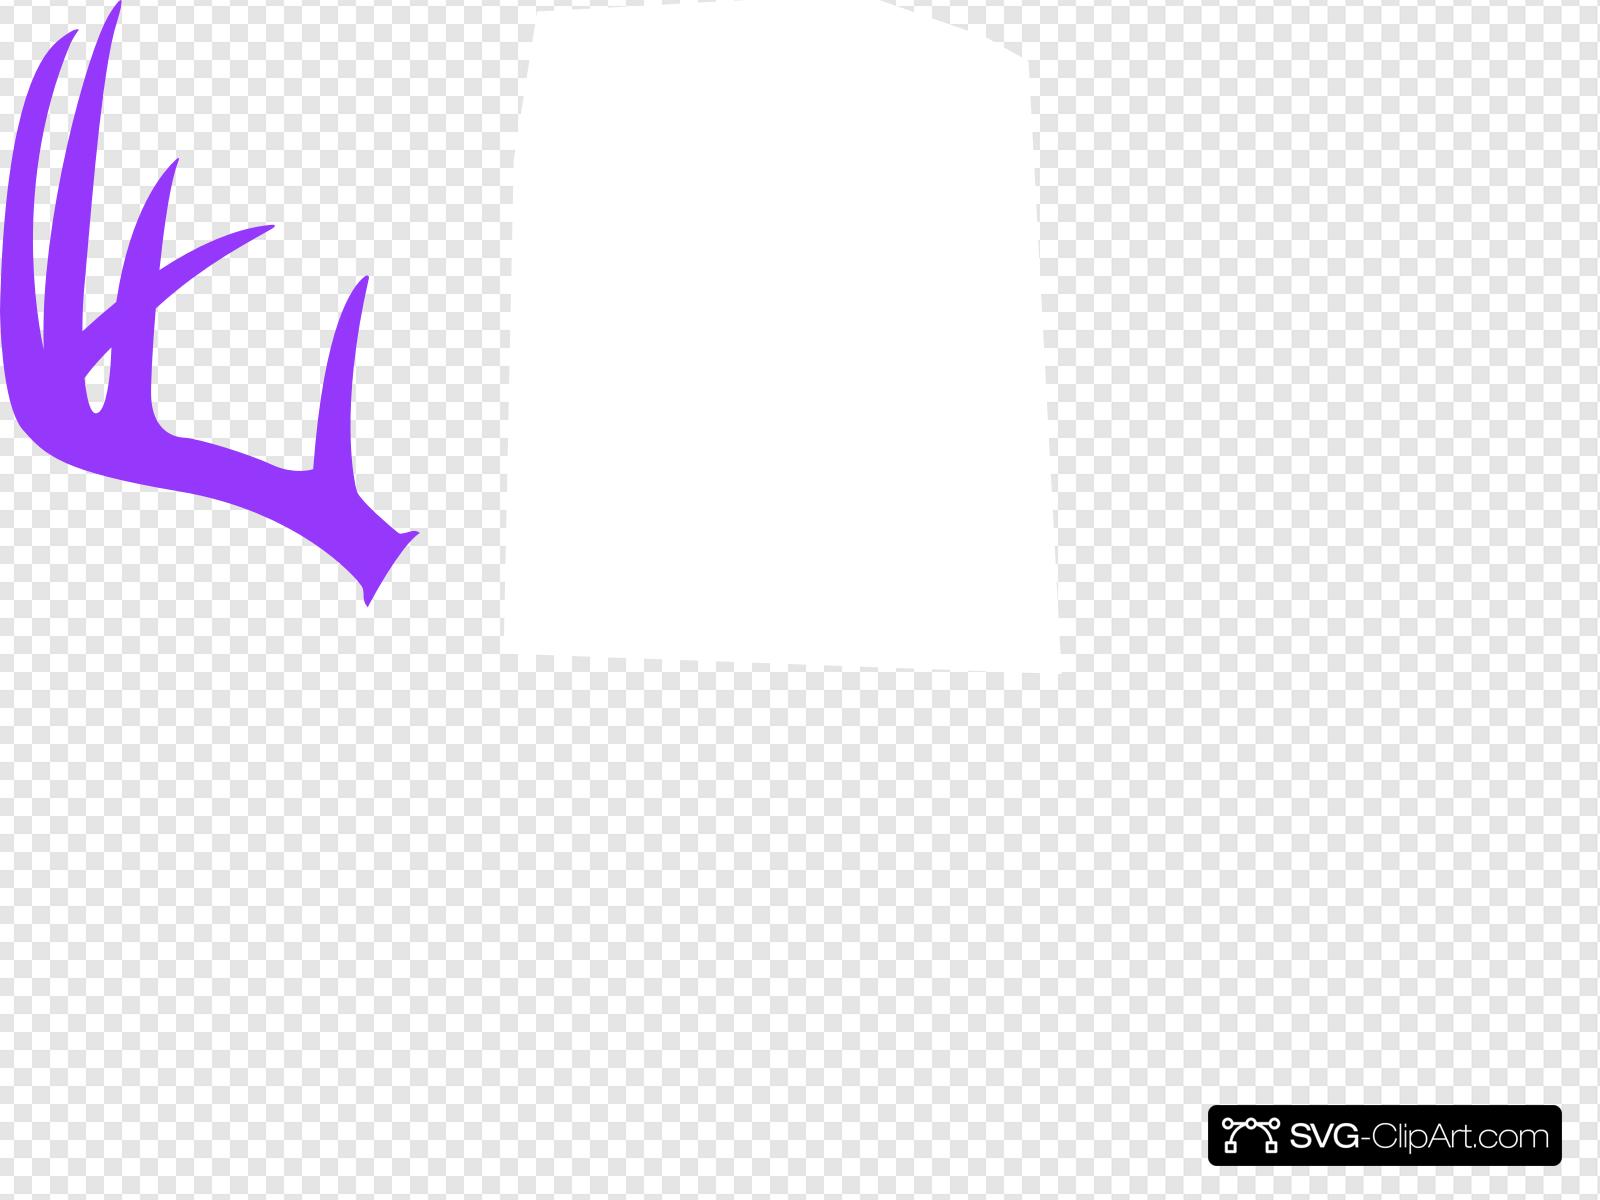 Antler clipart svg royalty free library Antler Clip art, Icon and SVG - SVG Clipart royalty free library